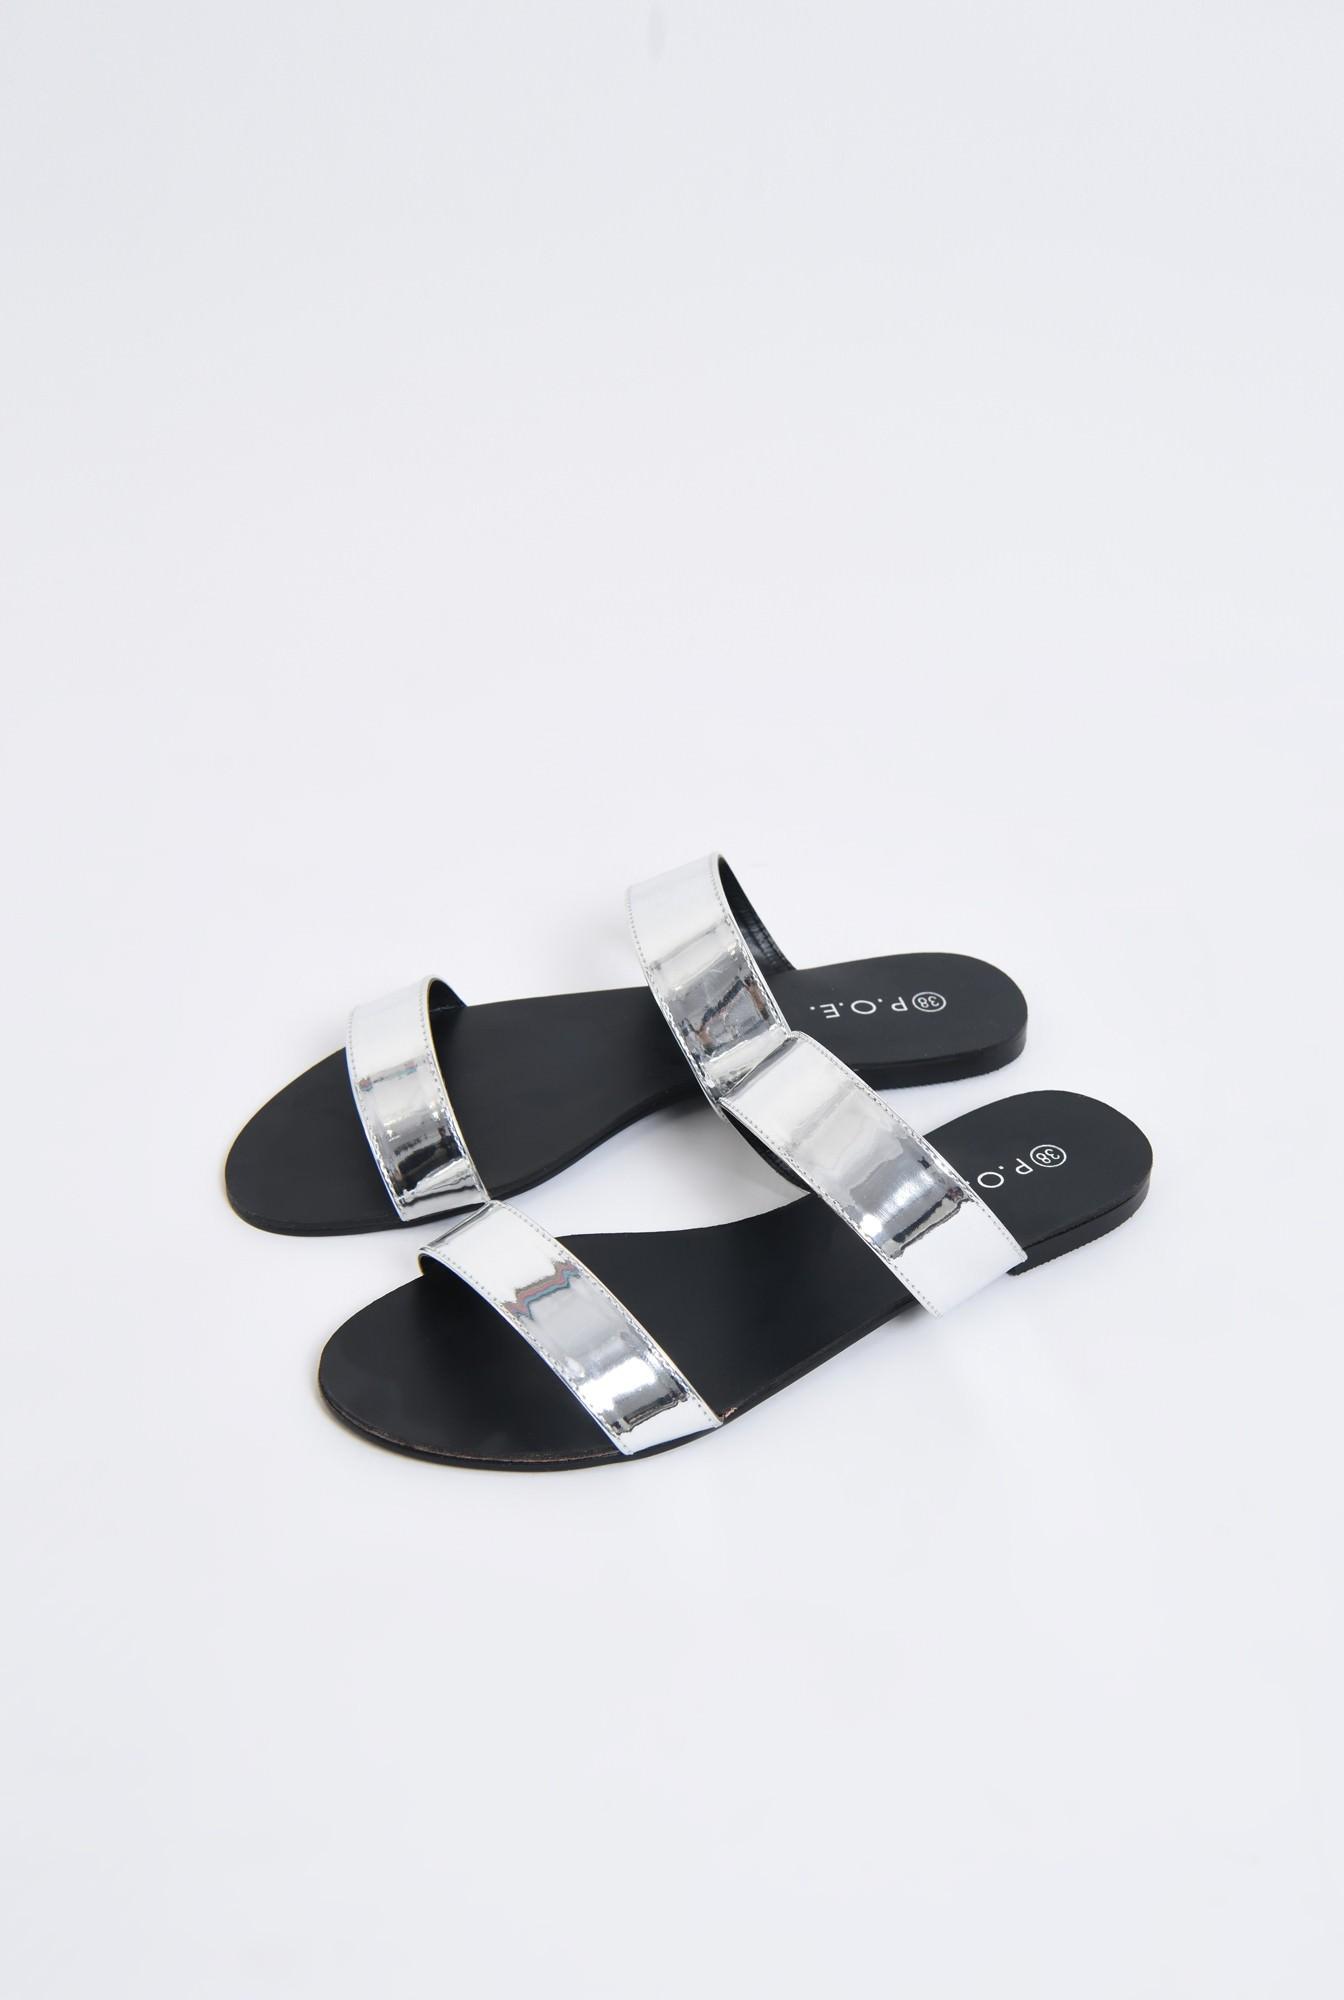 1 - papuci argintii, aspect metalic, cu talpa joasa